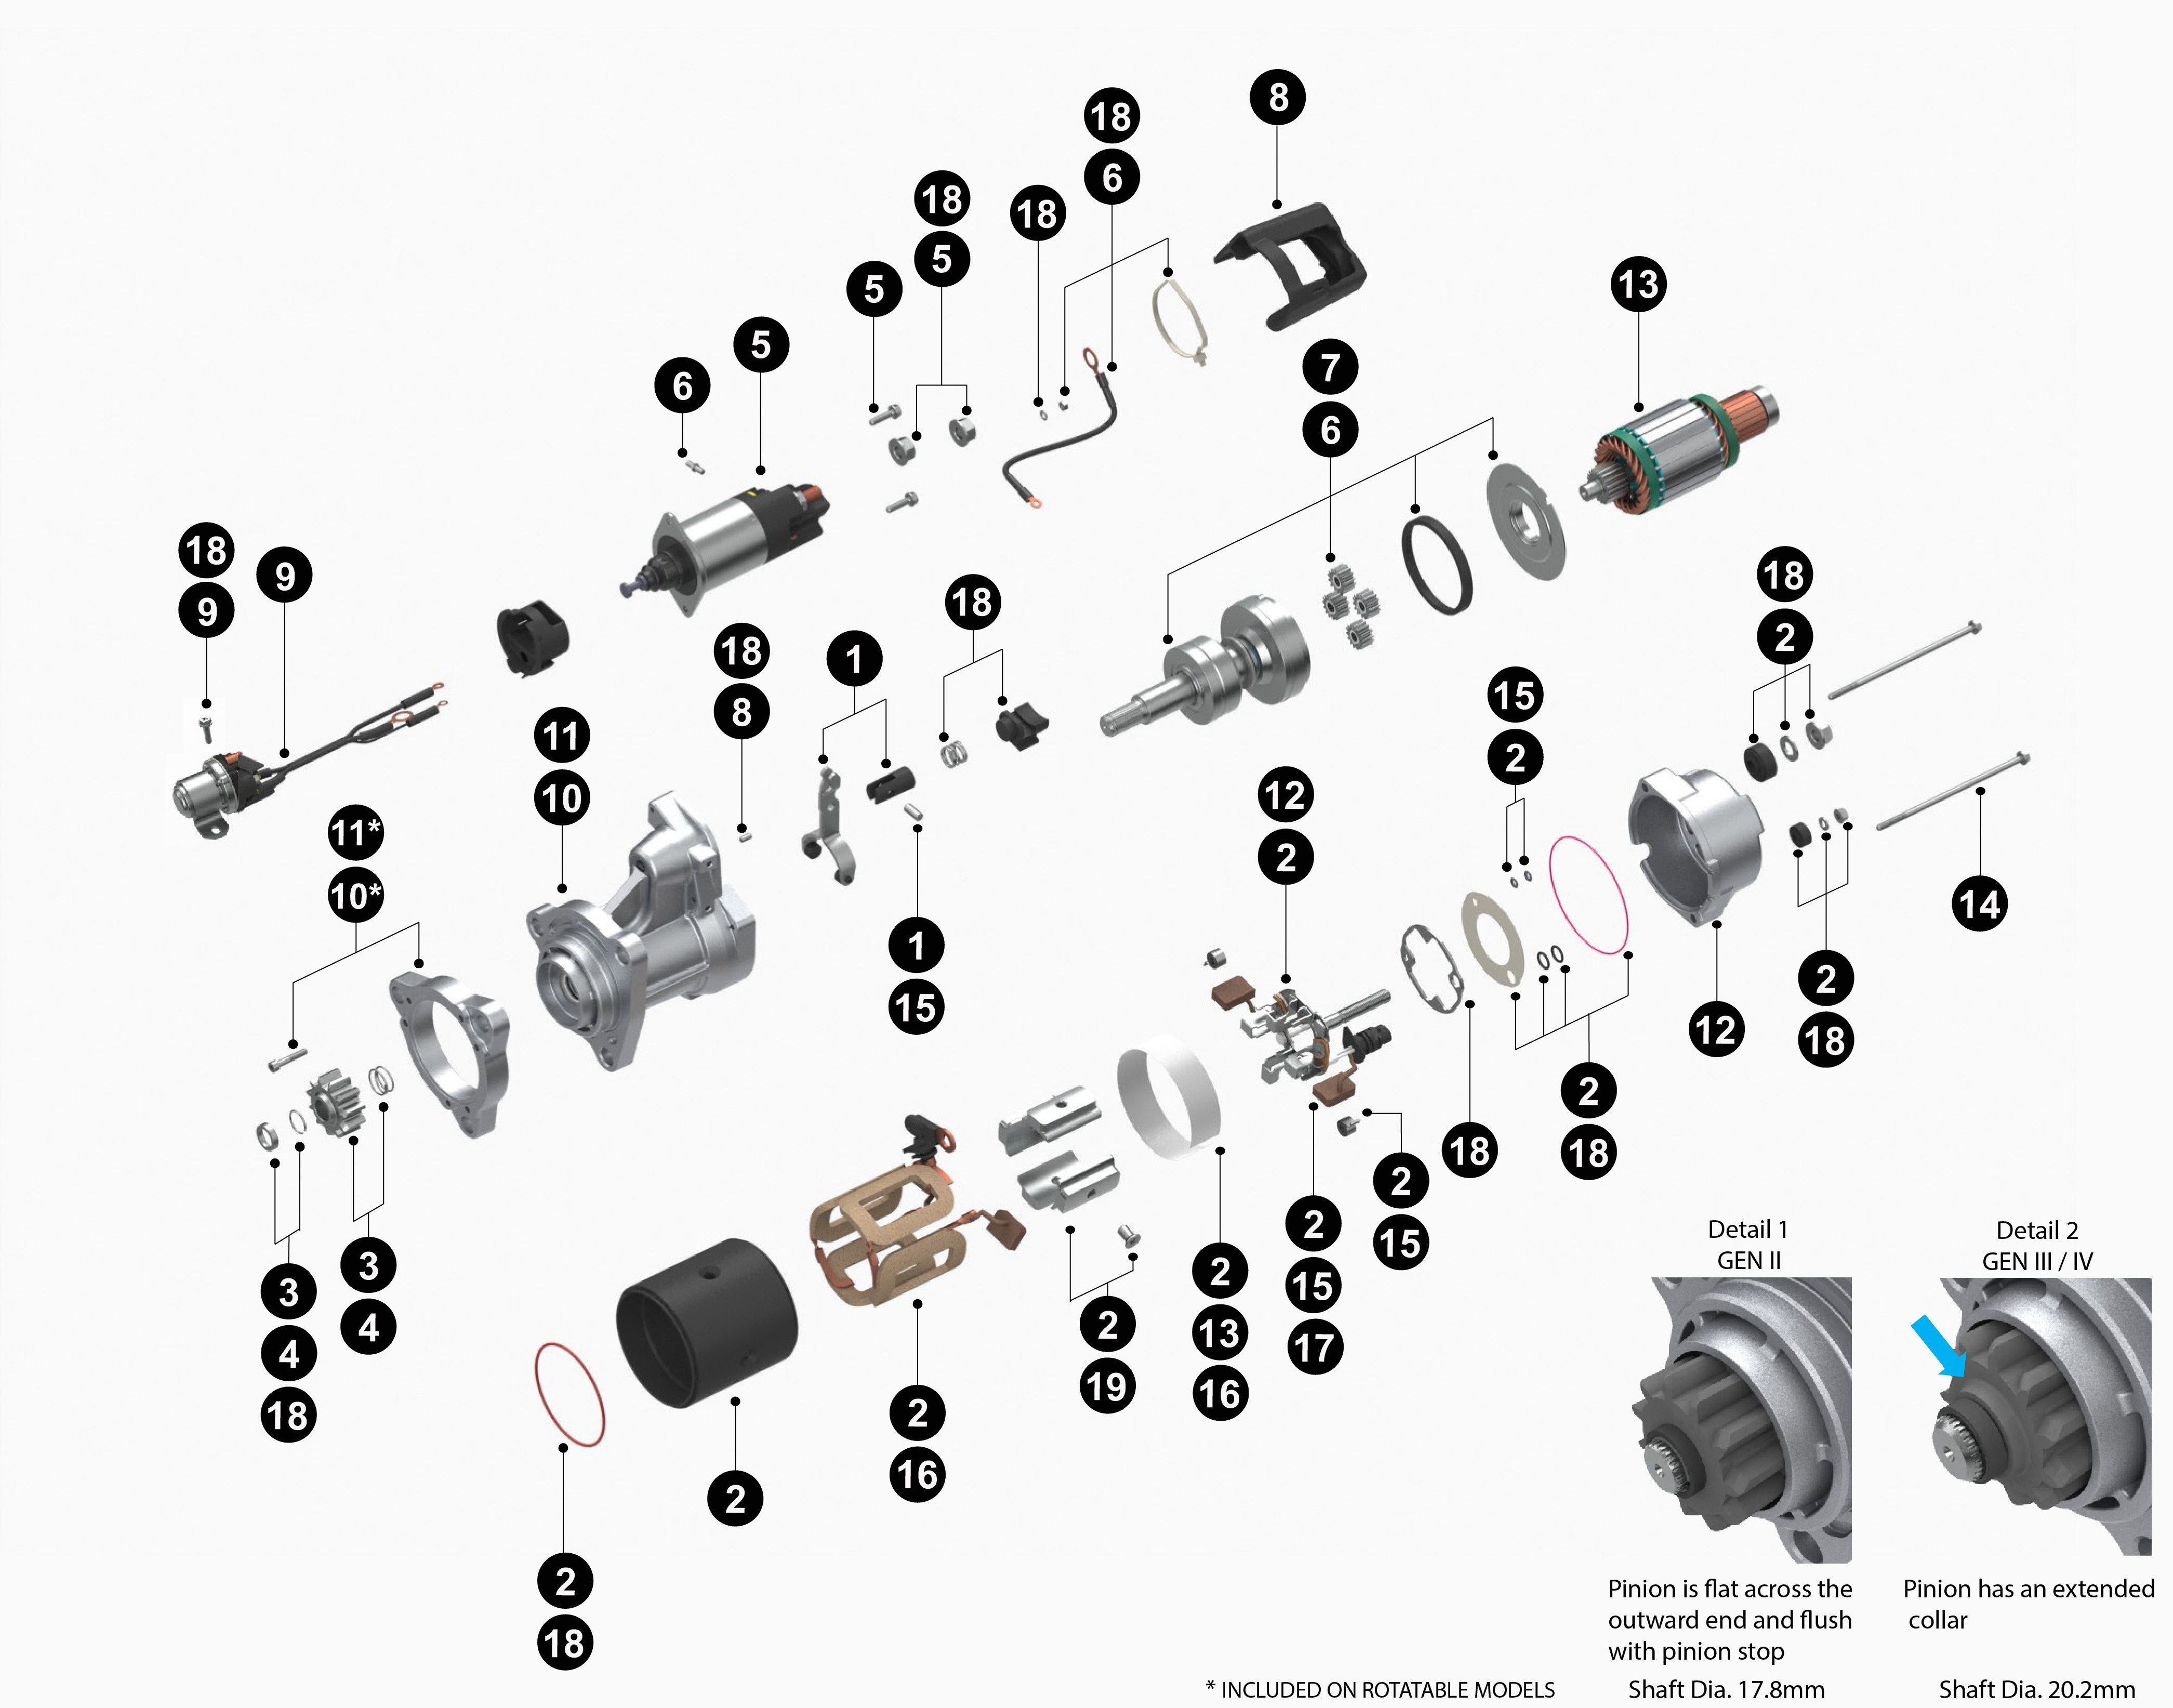 Mack Mp8 Engine Diagram 39mt New Starter Product Details Of Mack Mp8 Engine Diagram